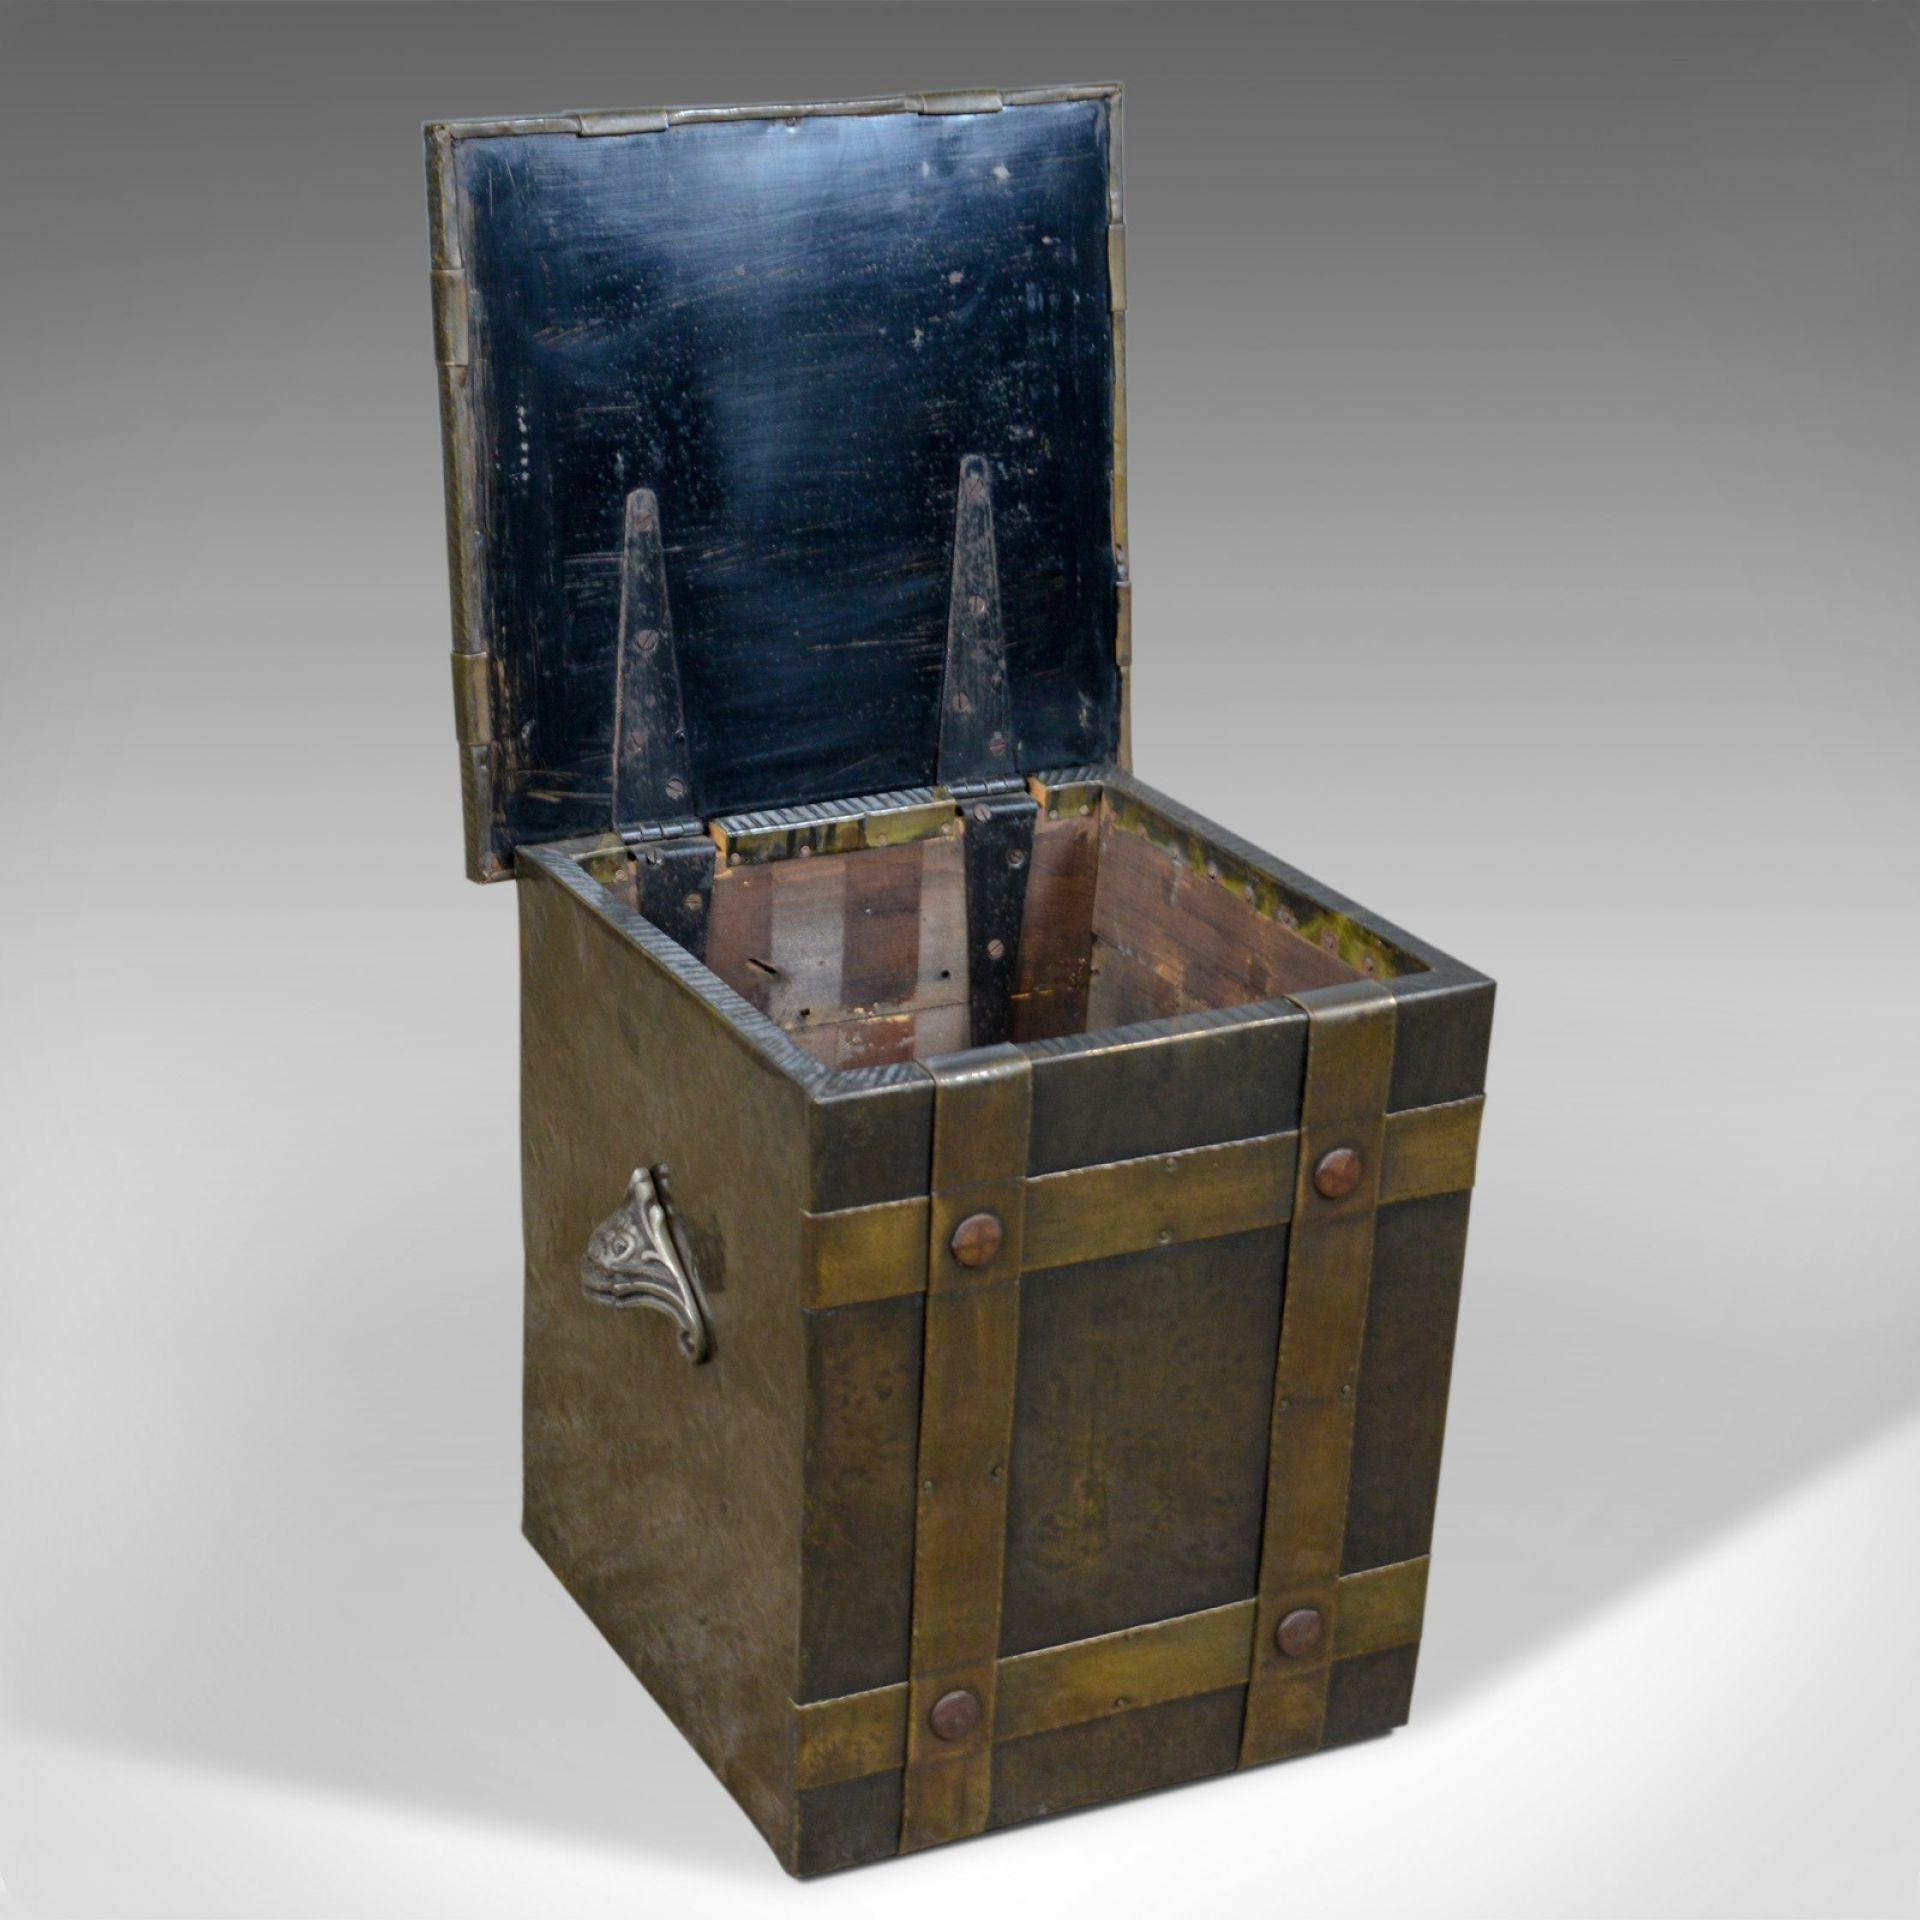 Antique Log Bin, Edwardian, Bound Metal, Fireside Box, Arts and Crafts, c.1910